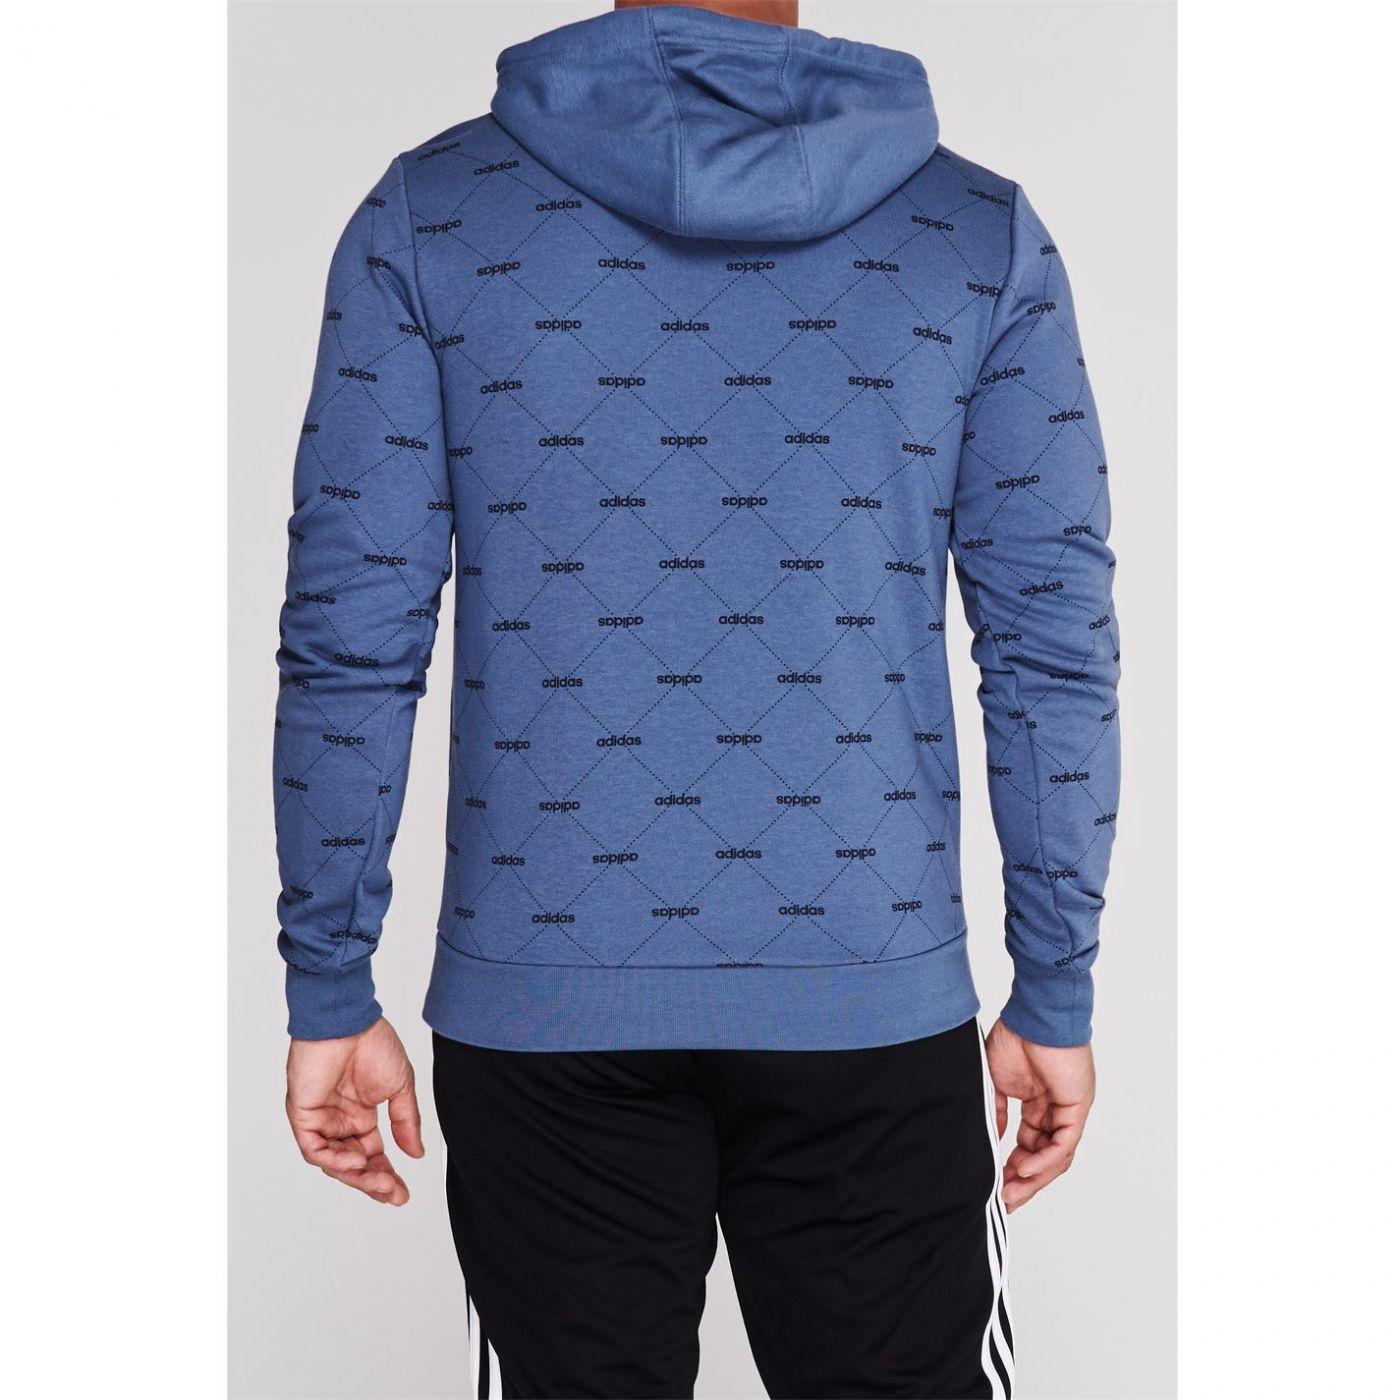 Adidas All Over Printed Hoodie Mens